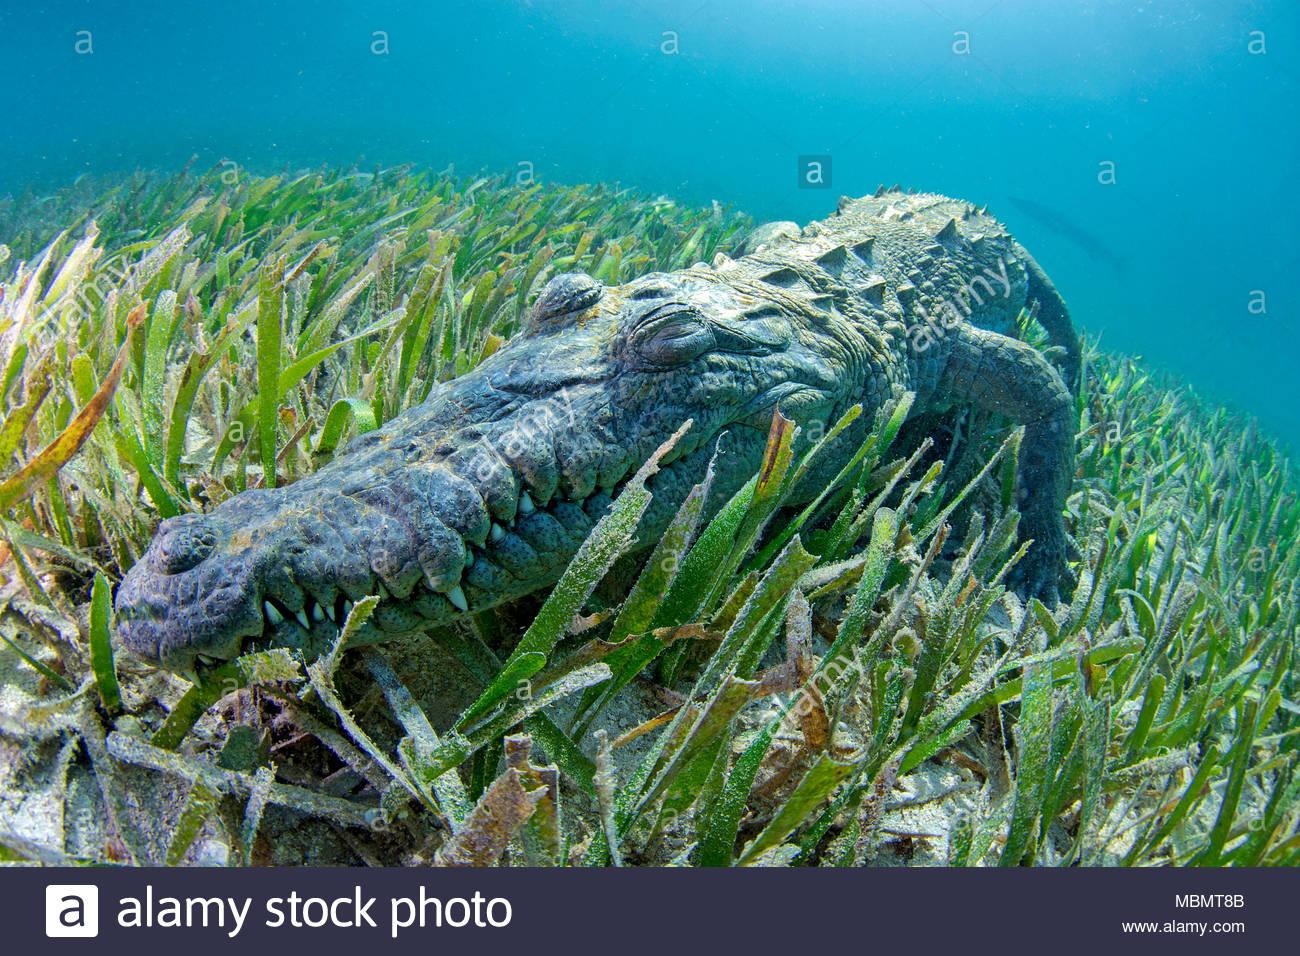 Spitzkrokodil (Crocodylus acutus), Jardines de la Reina, Kuba | American crocodile (Crocodylus acutus), Jardines de la Reina, Cuba - Stock Image